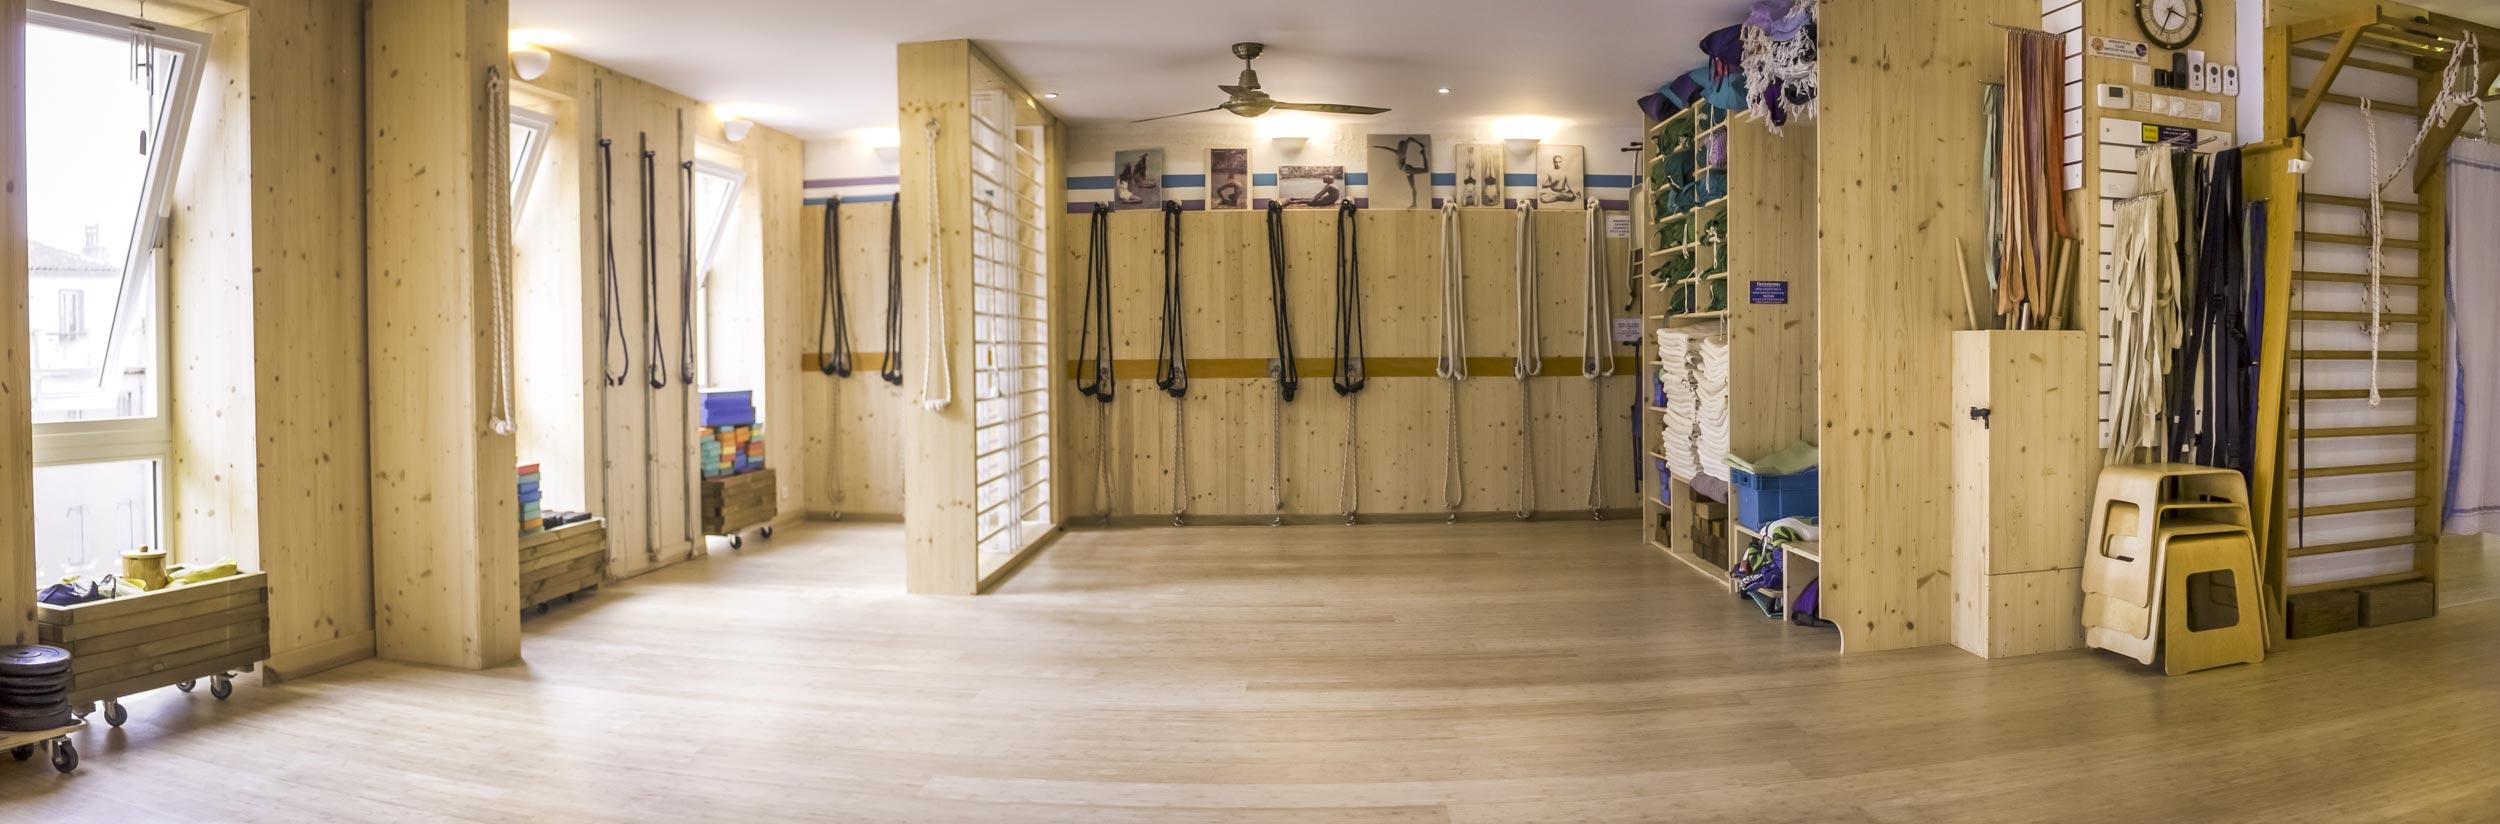 salle de pratique yoga yoga iyengar marseille. Black Bedroom Furniture Sets. Home Design Ideas